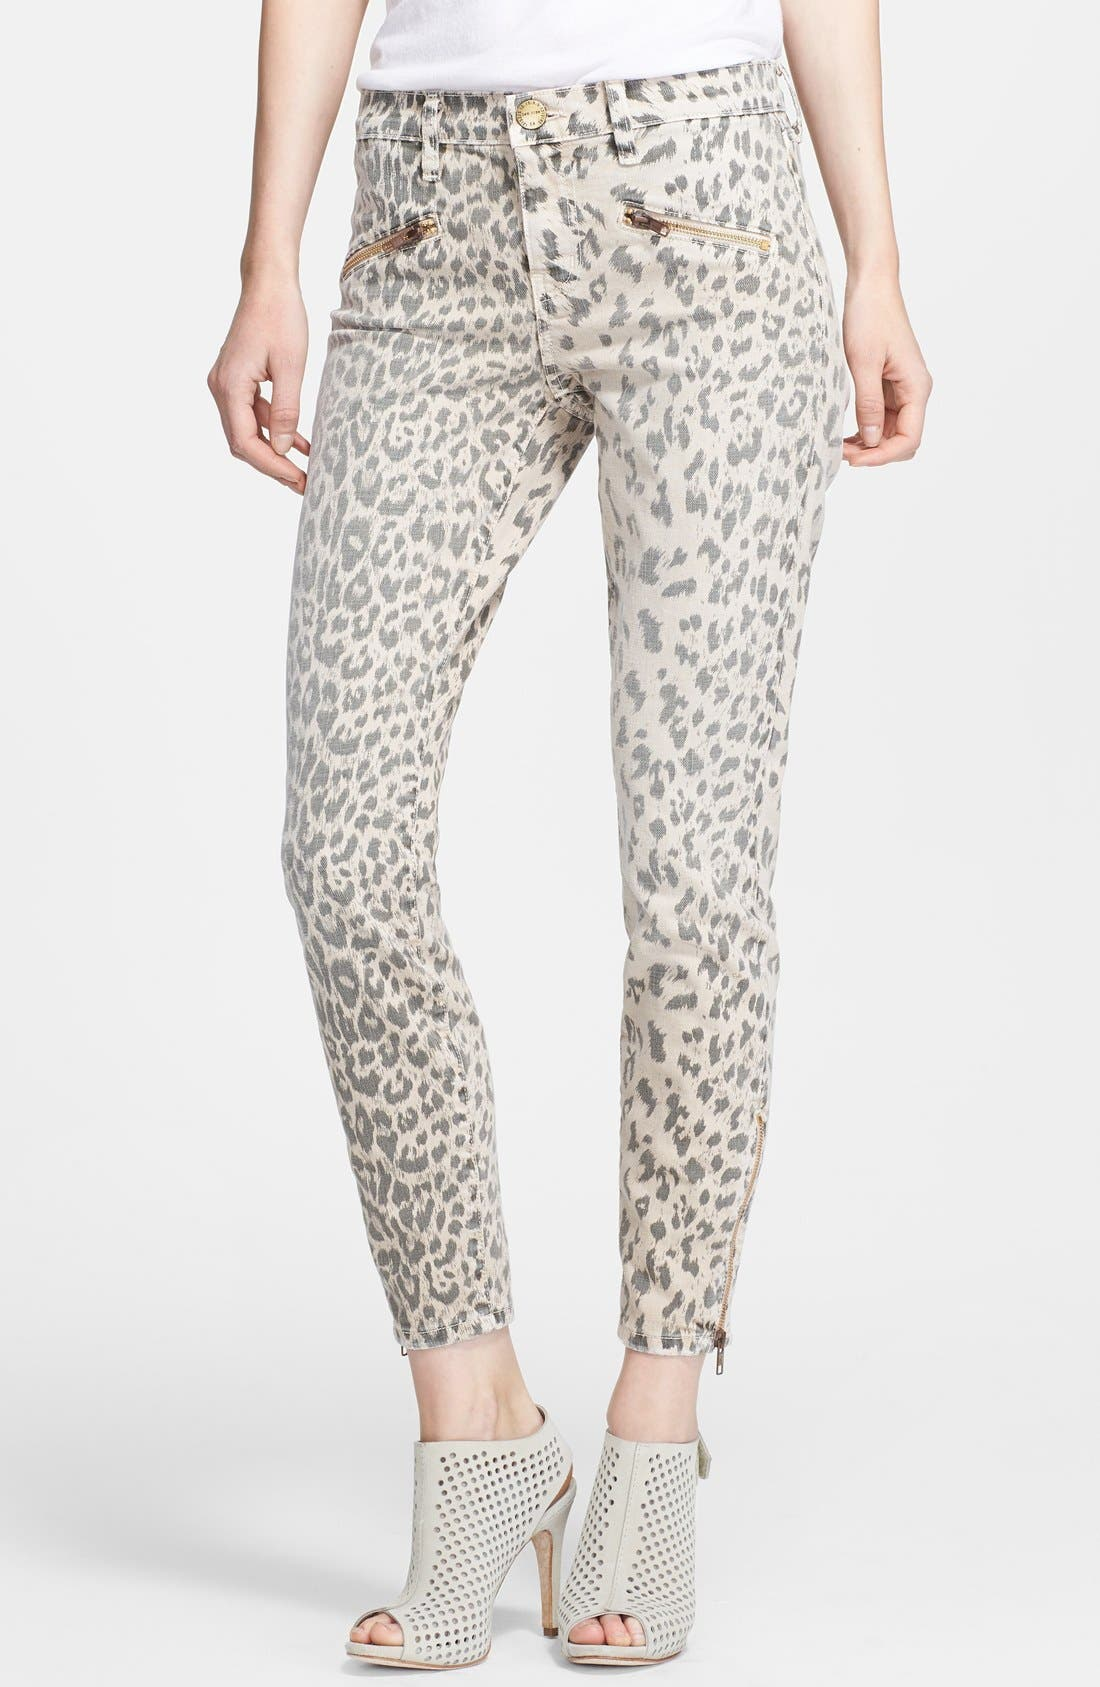 Main Image - Current/Elliott 'The Soho' Leopard Print Zip Skinny Jeans (Stone Leopard)